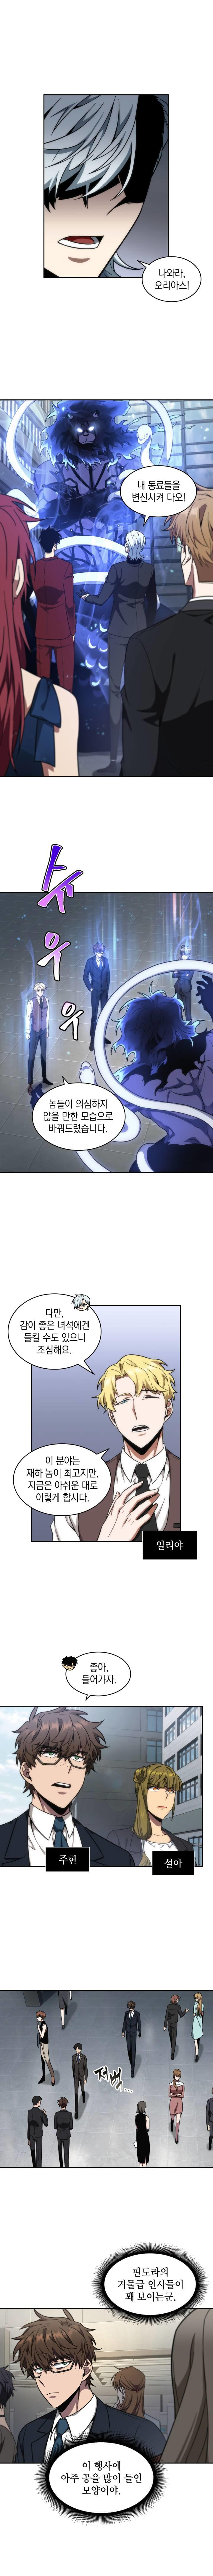 Tomb Raider King Chapter 252 page 10 - Mangakakalot